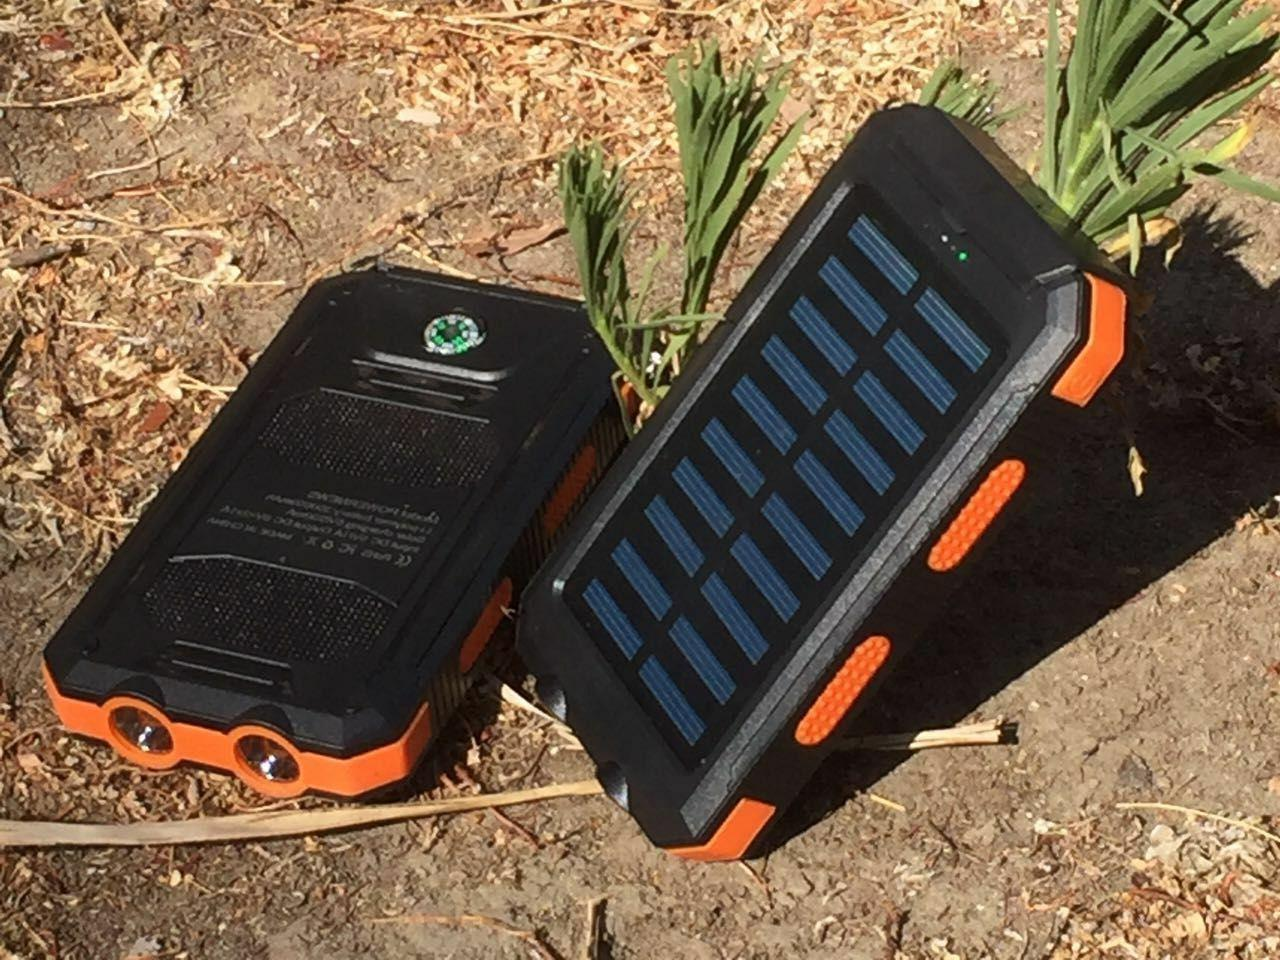 2021 2000000mAh USB Portable Bank